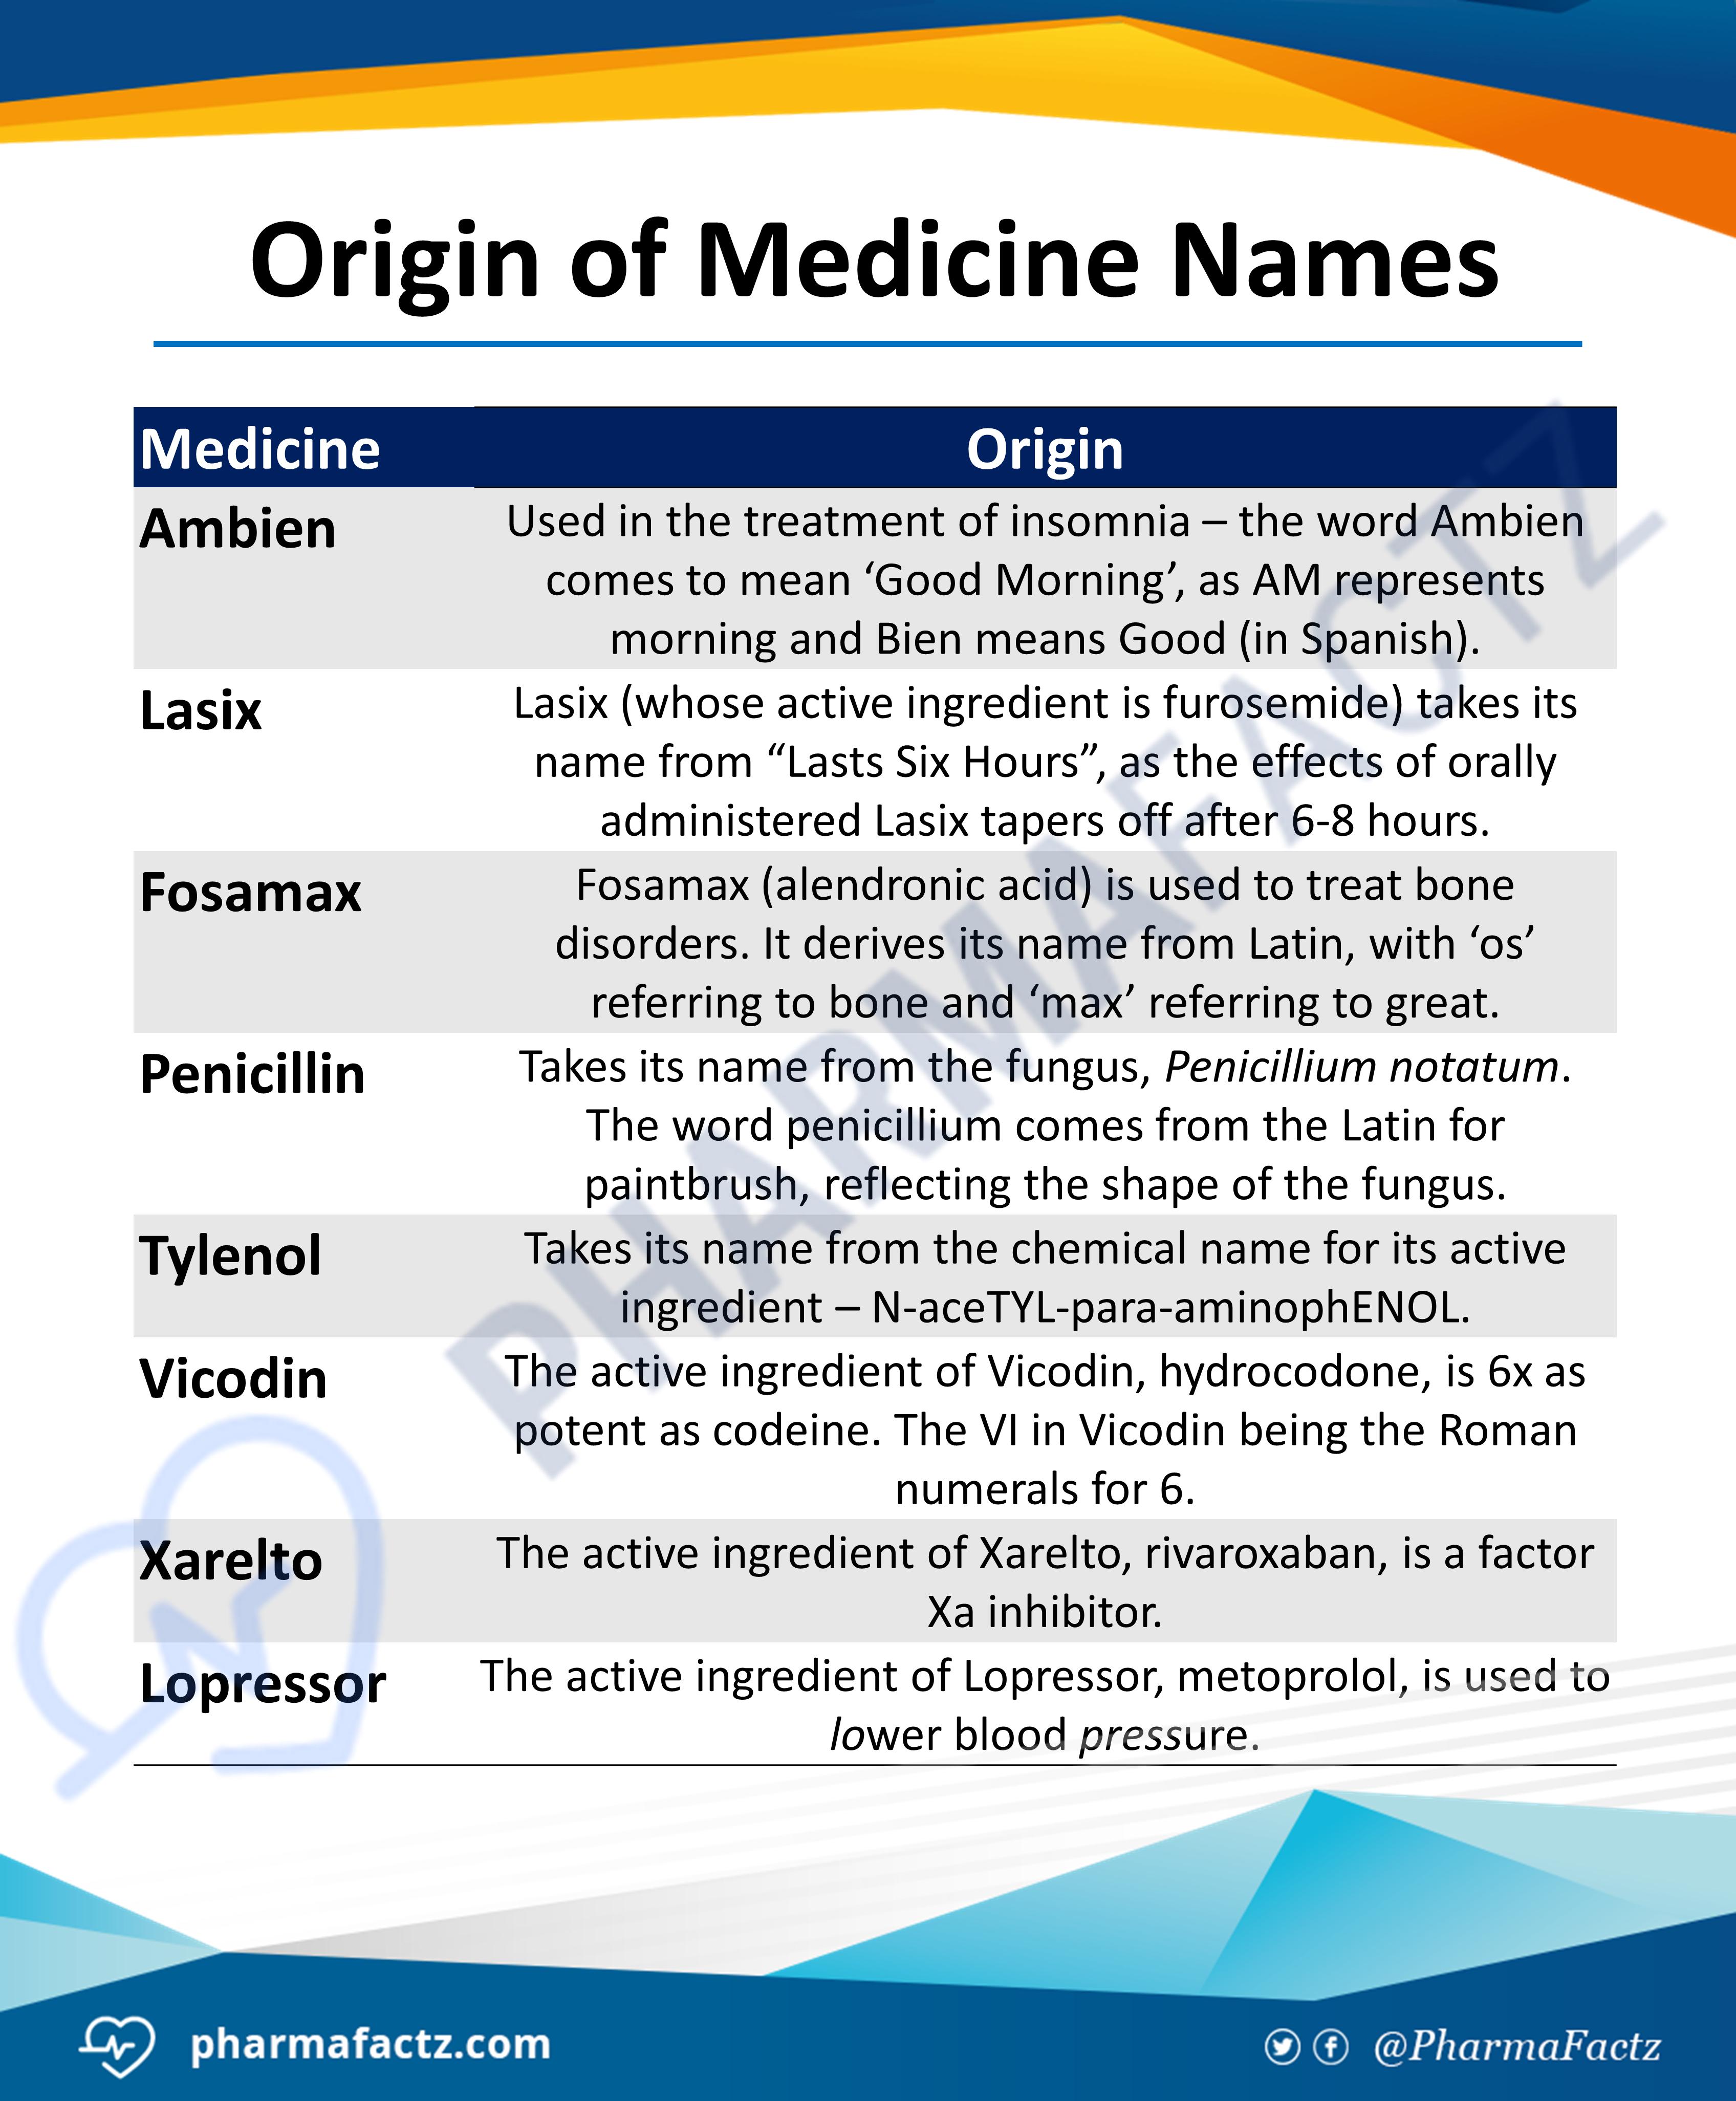 Origin of Medicine Names